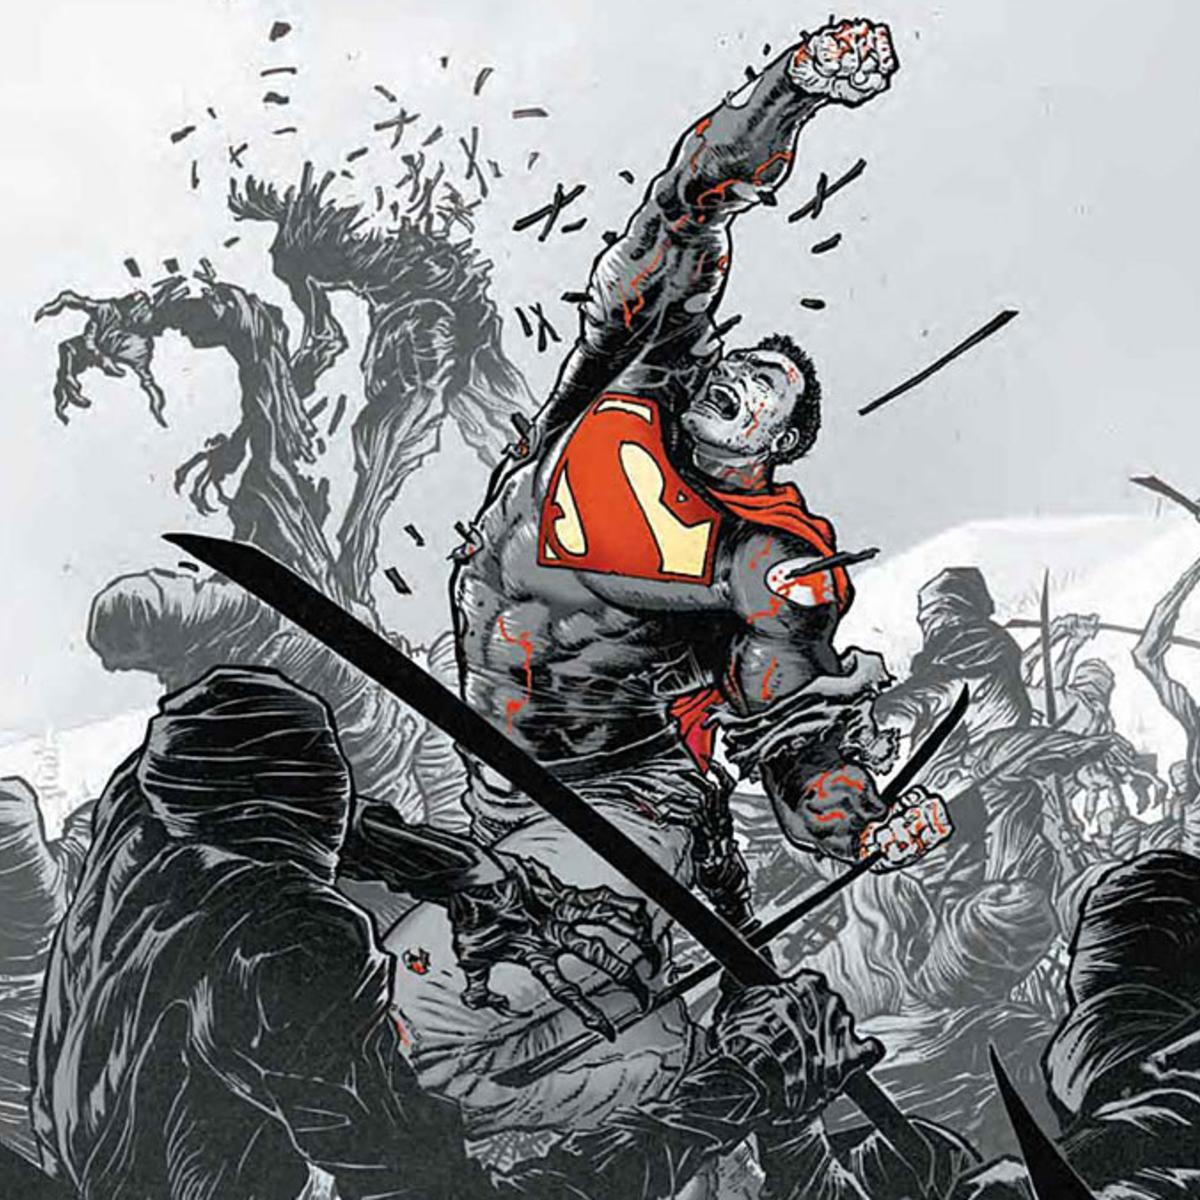 Action_Comics_41.png